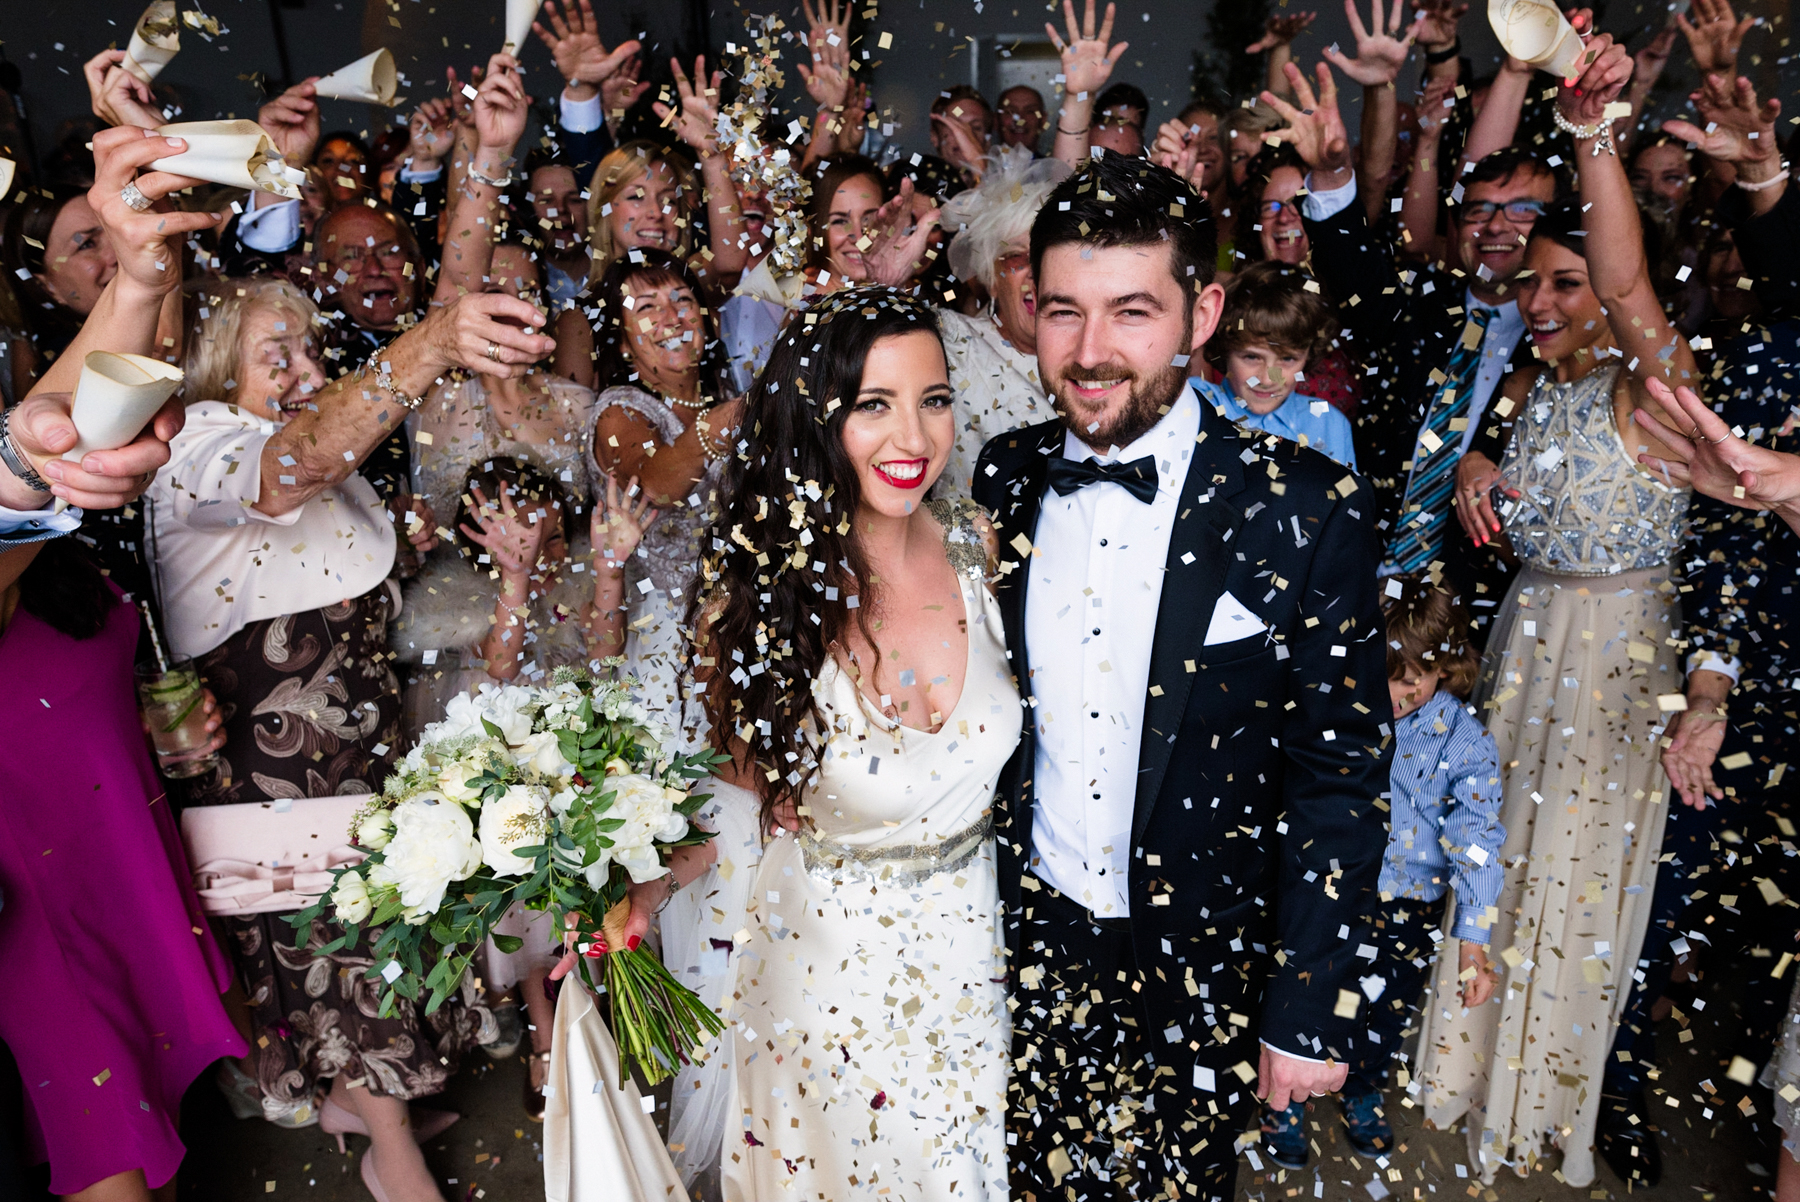 The Chainstore wedding Confetti shower